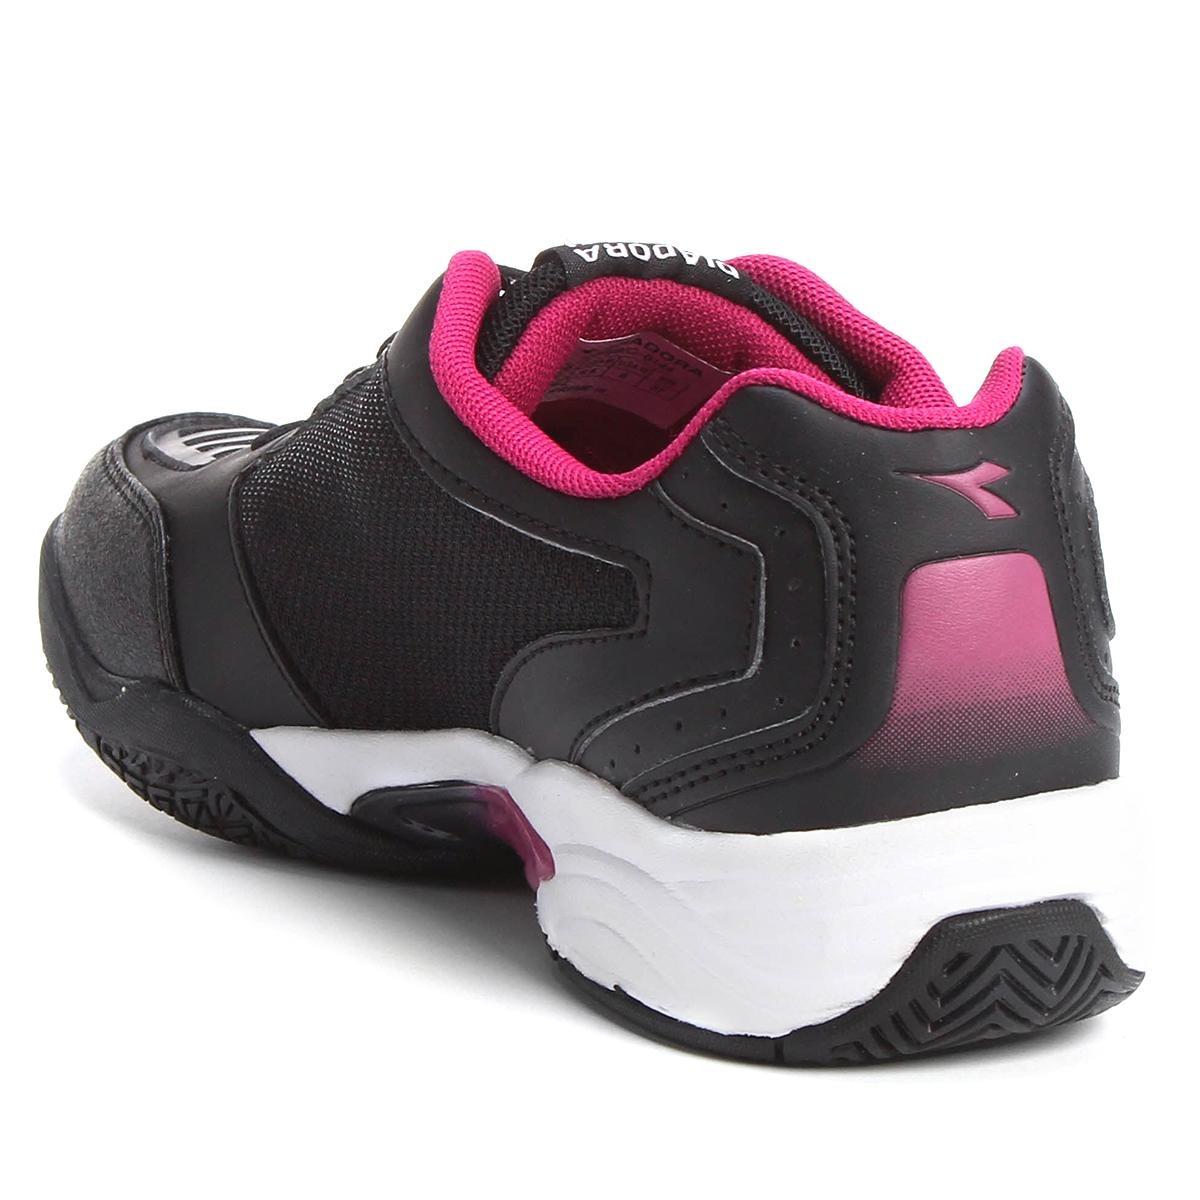 2b5c2ef98a9 Tênis Diadora Hi Supreme 3 Feminino - Cor Preto+pink - R  129